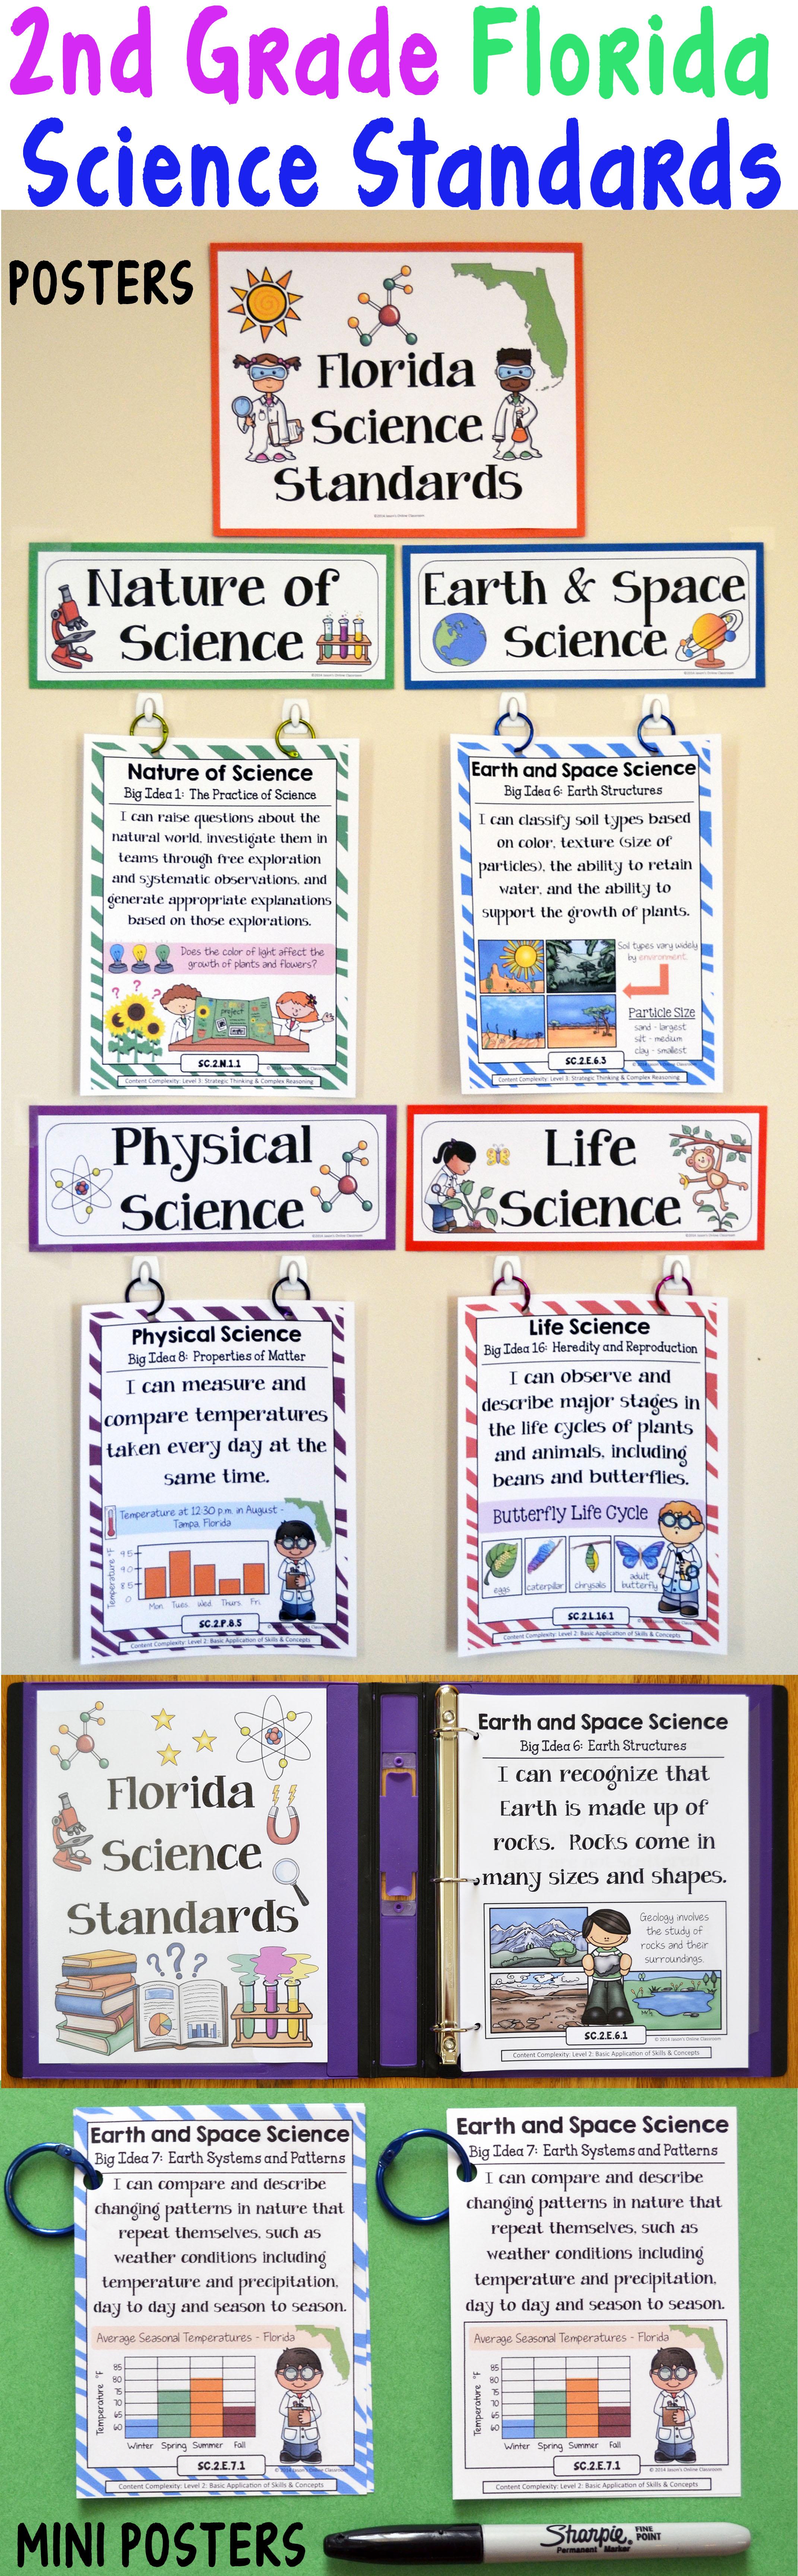 2nd Grade Florida Science Standards